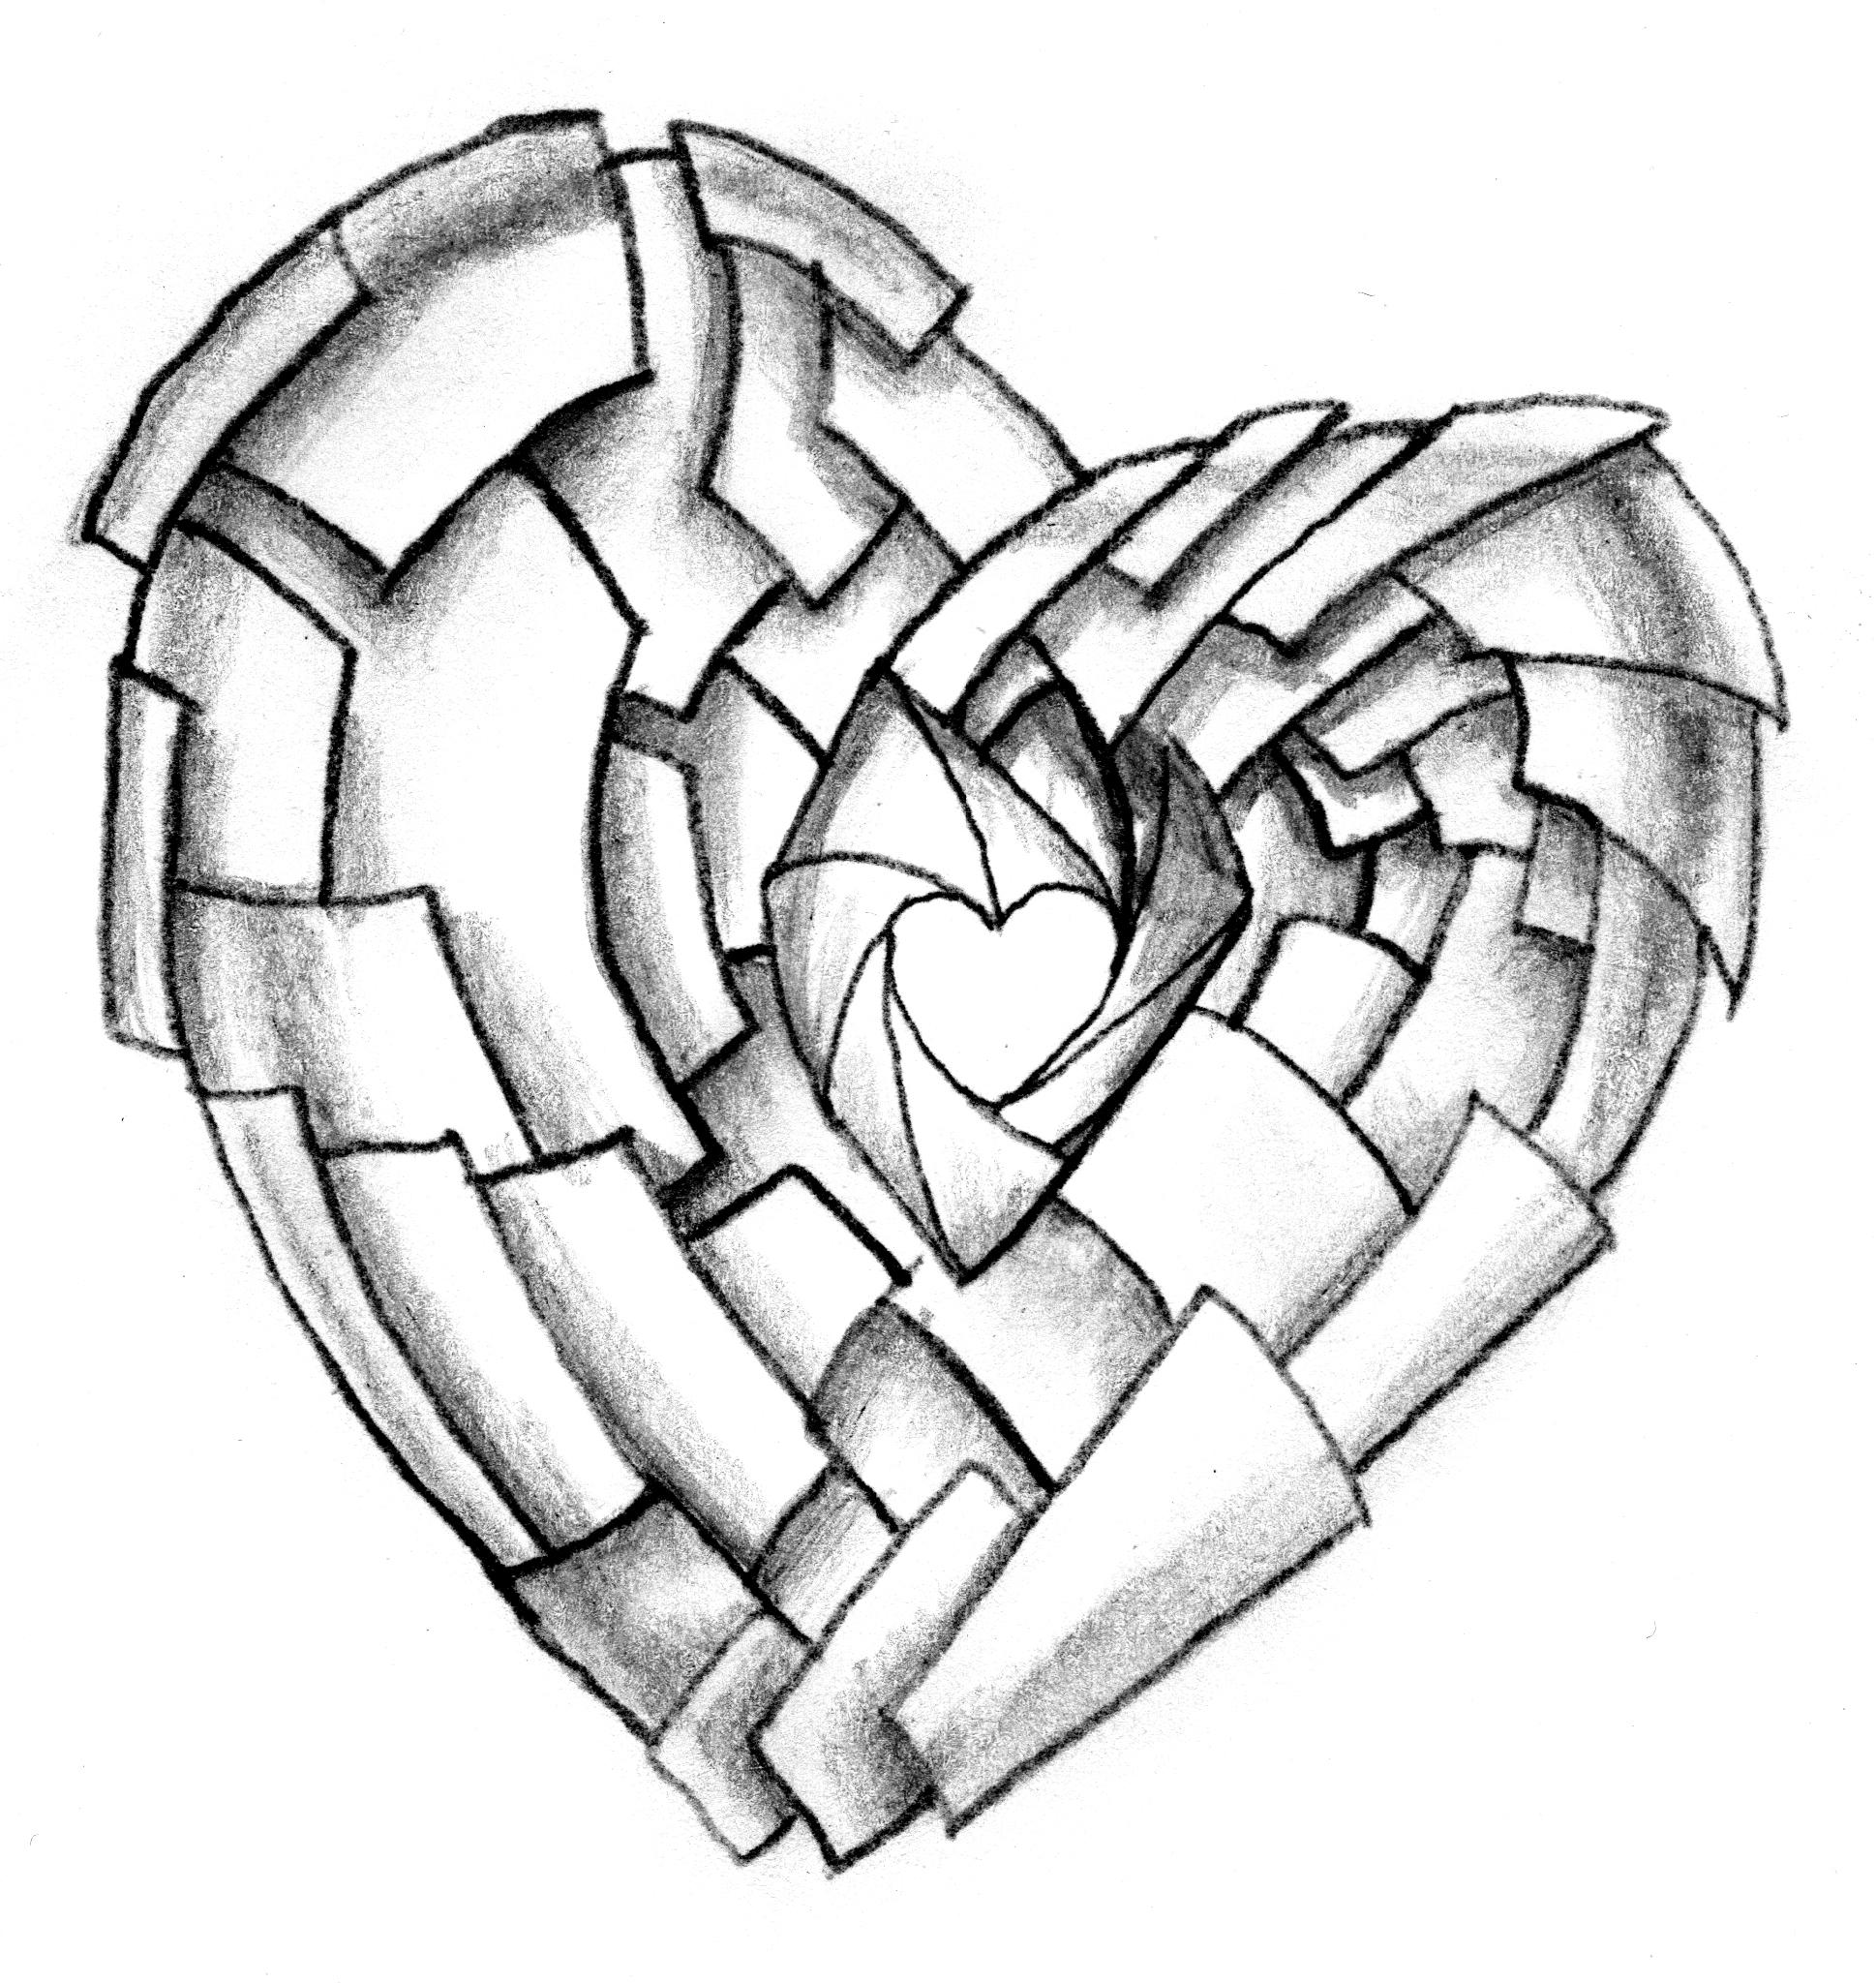 1938x2048 Love Heart Draw Pencil Hd Image Heart Pencil Art Free Download